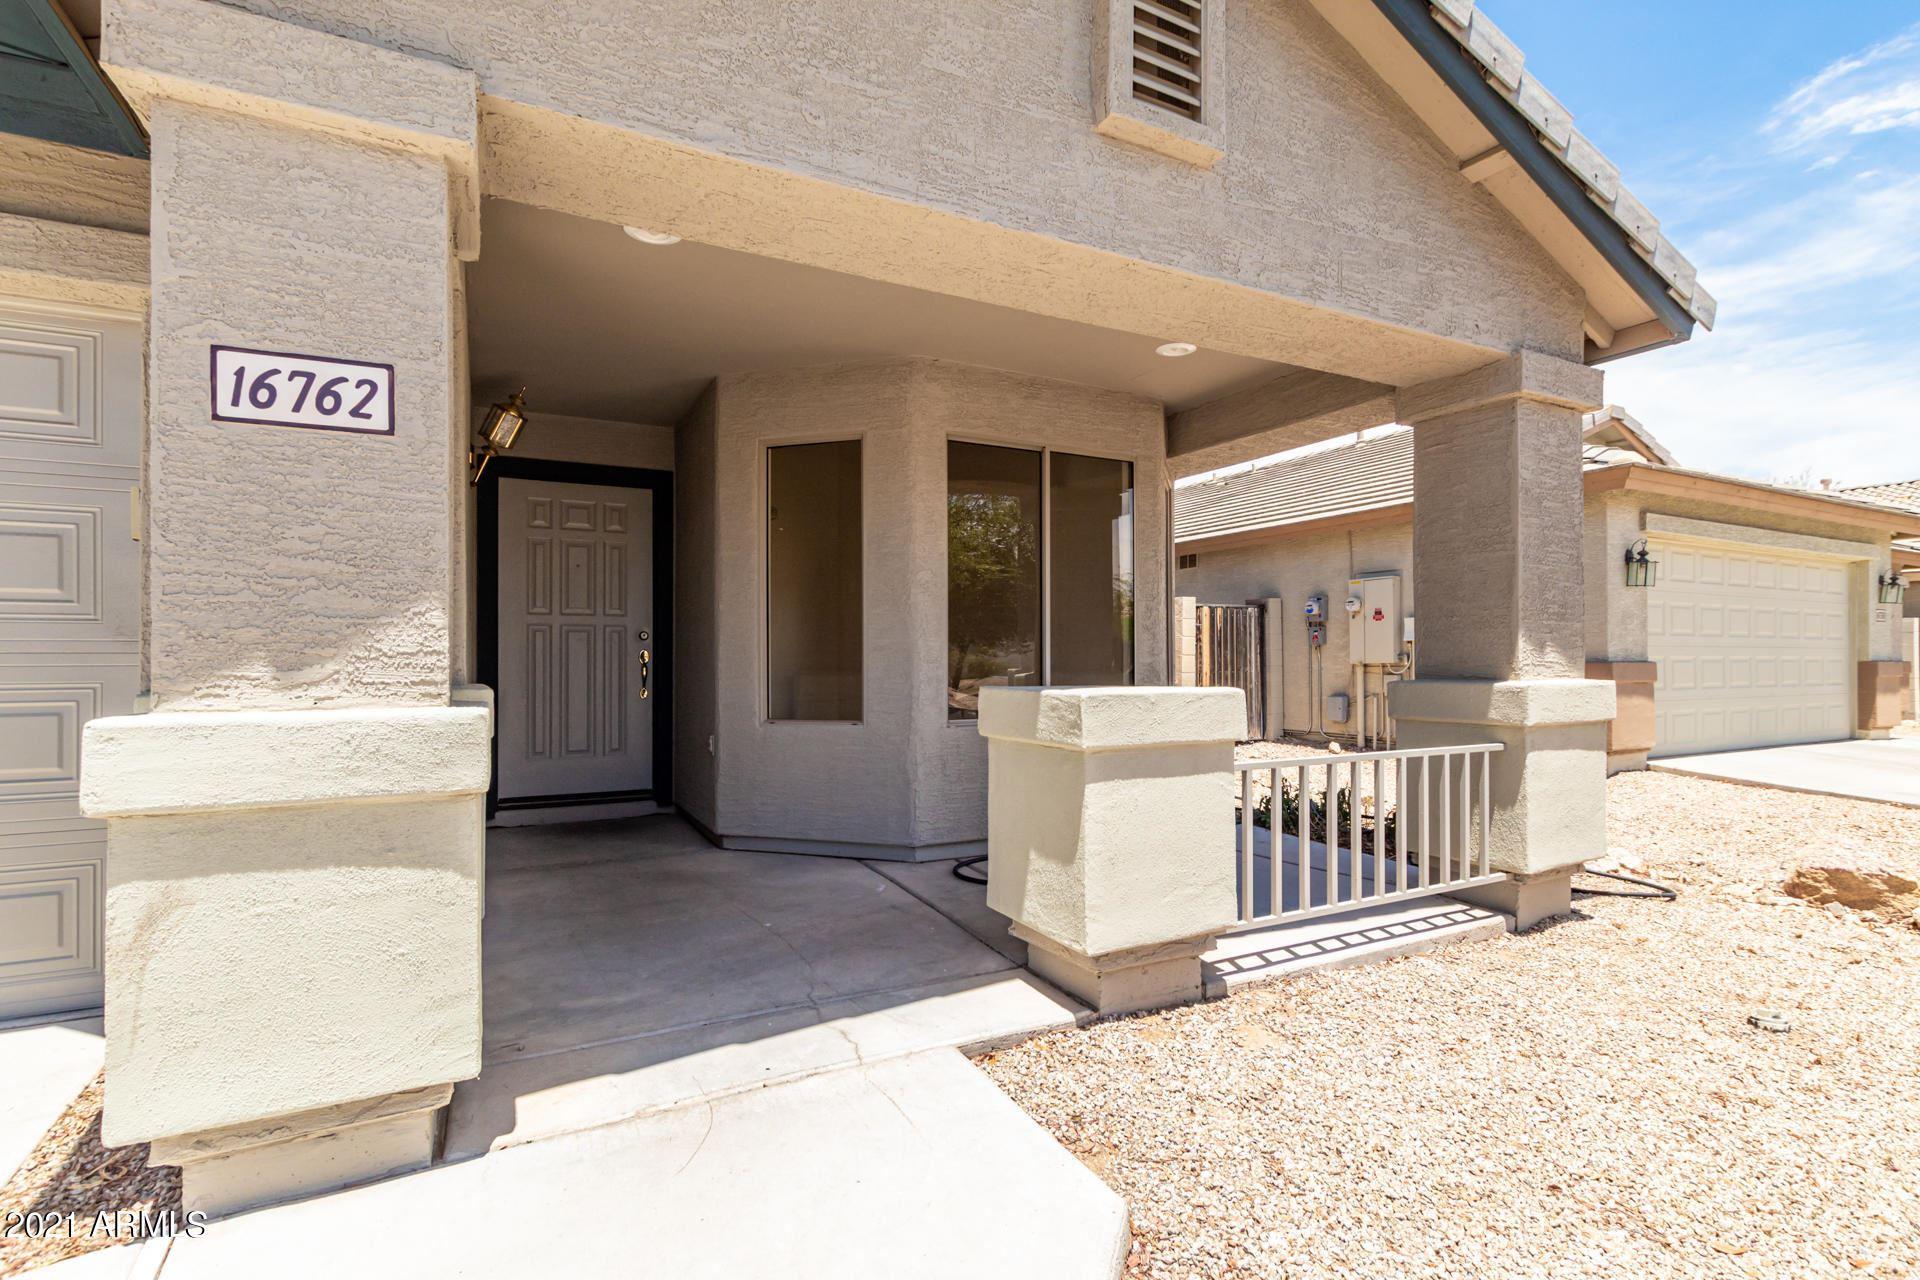 Photo of 16762 W TAYLOR Street, Goodyear, AZ 85338 (MLS # 6248257)